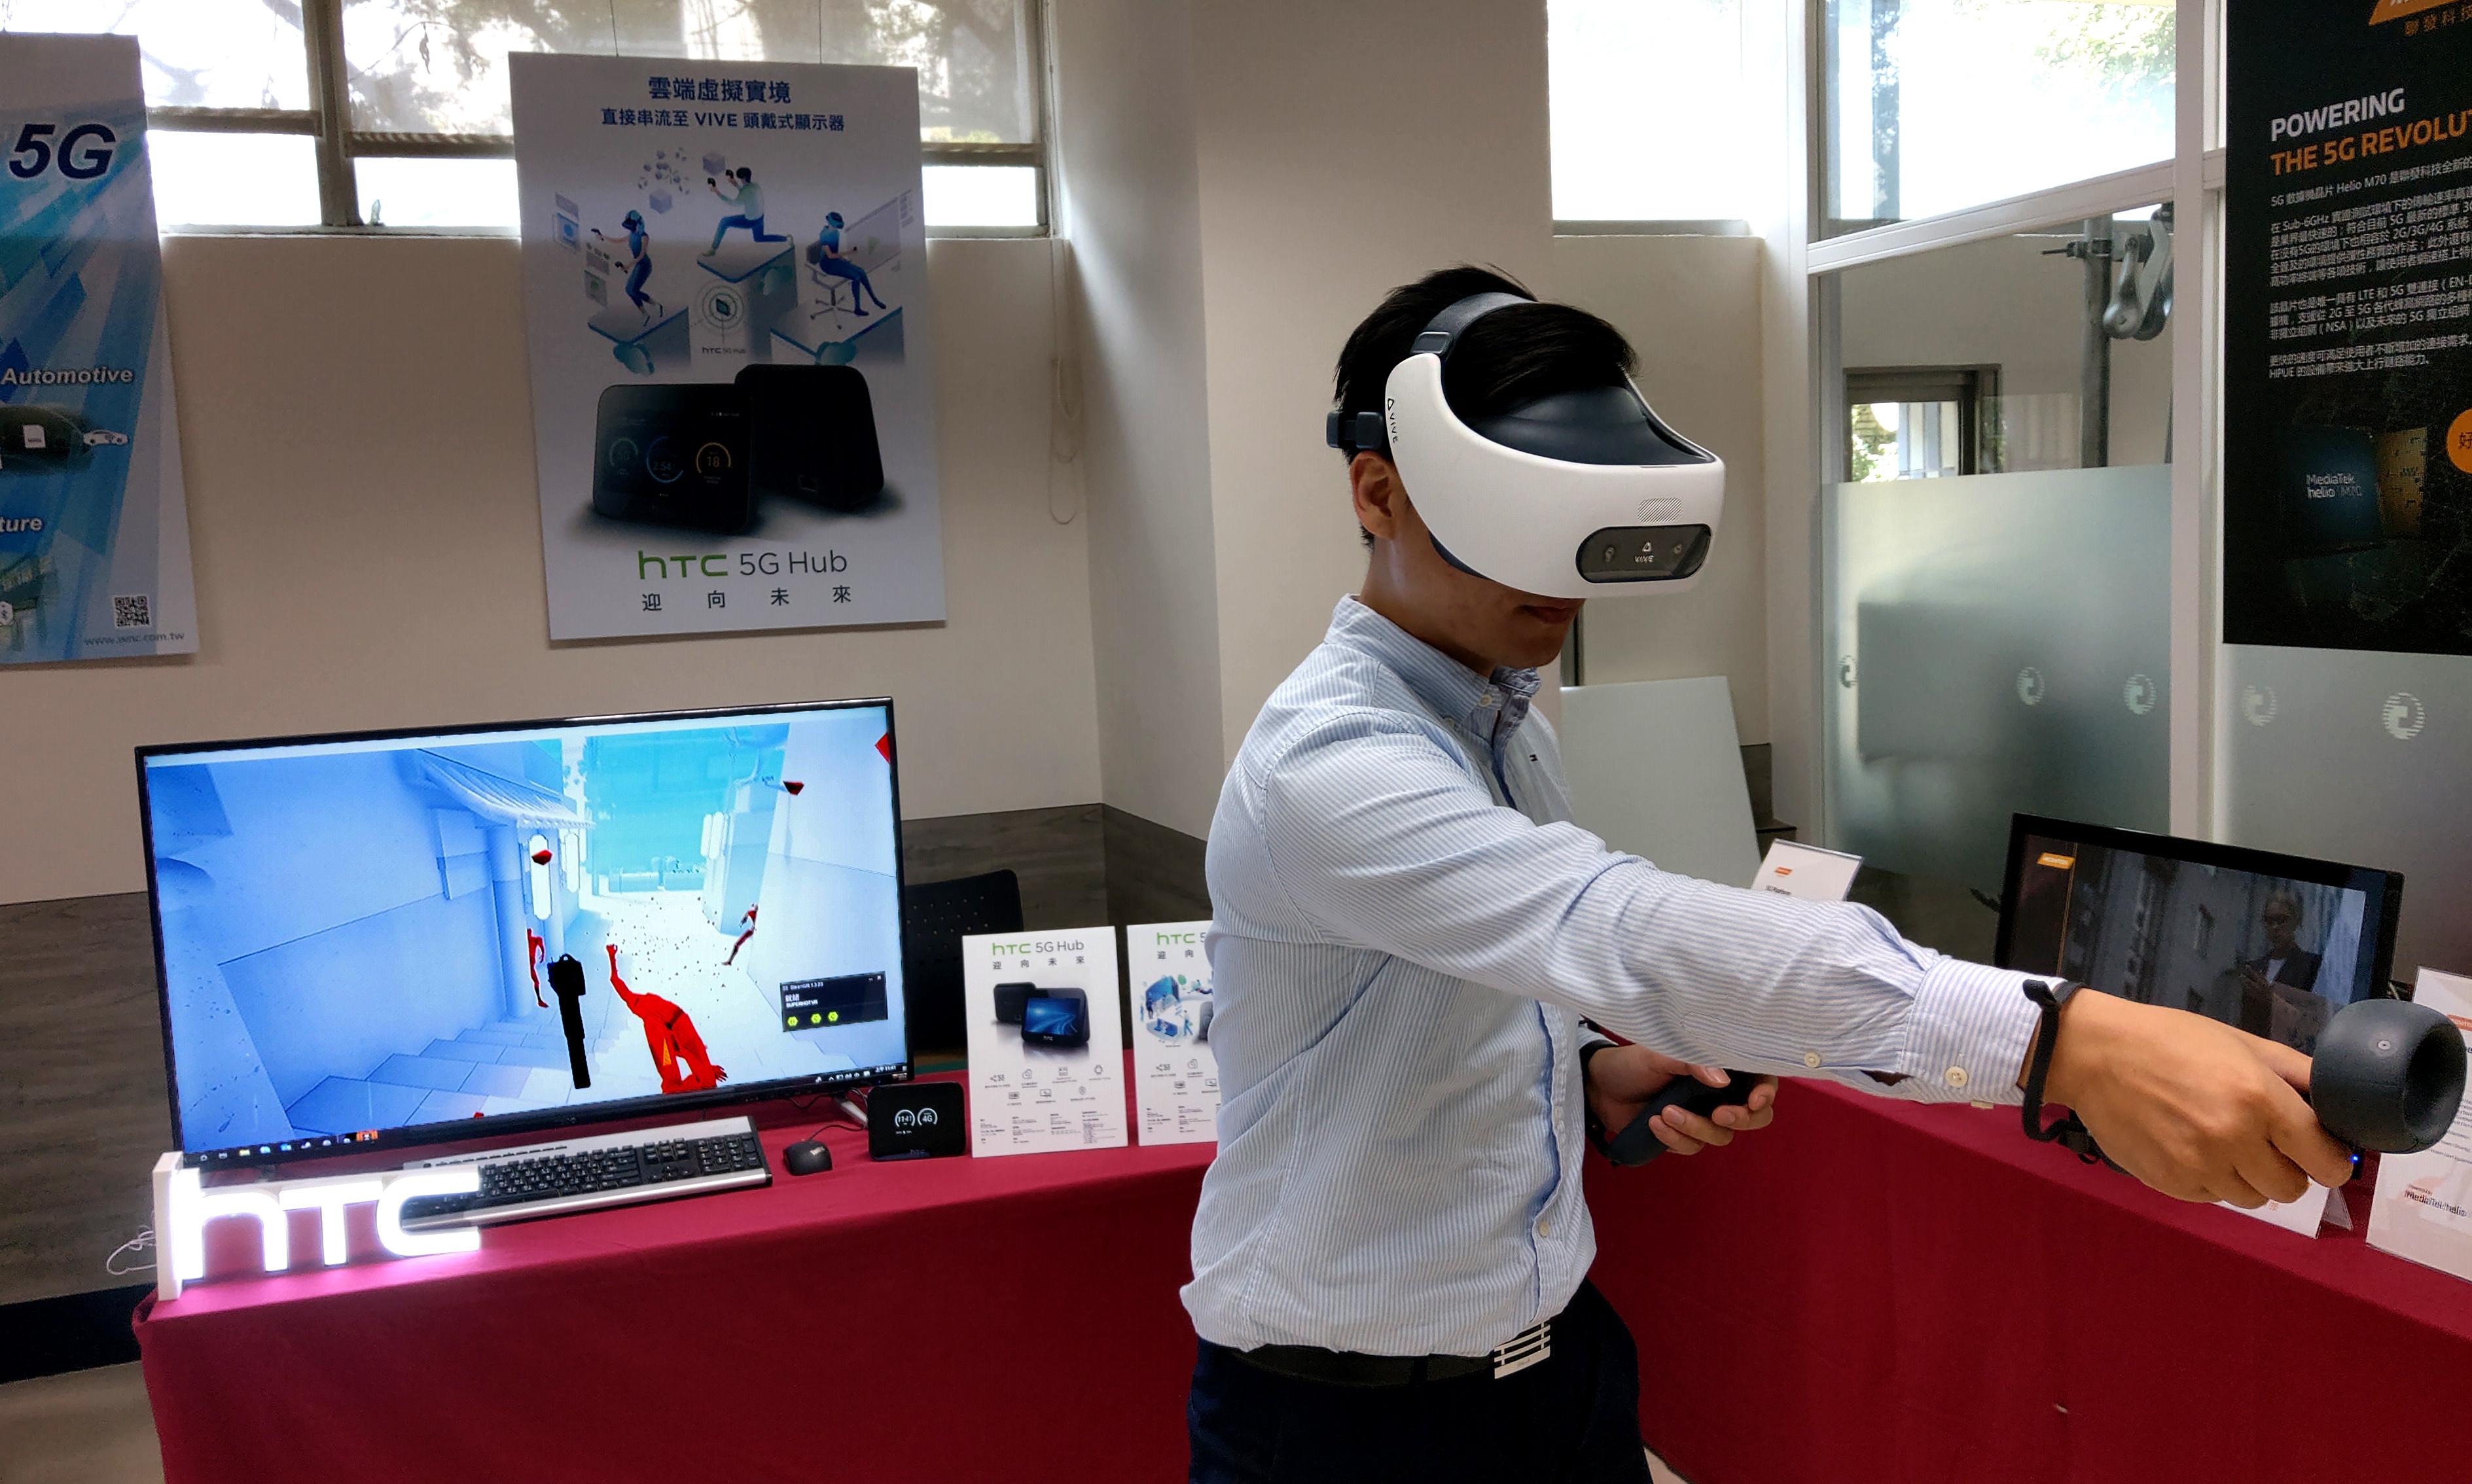 HTC新聞照片(中華電信5G領航隊年度大會中演示將PCVR內容透過HTC 5G Hub串流至單機VR設備VIVE Focus Plus上)